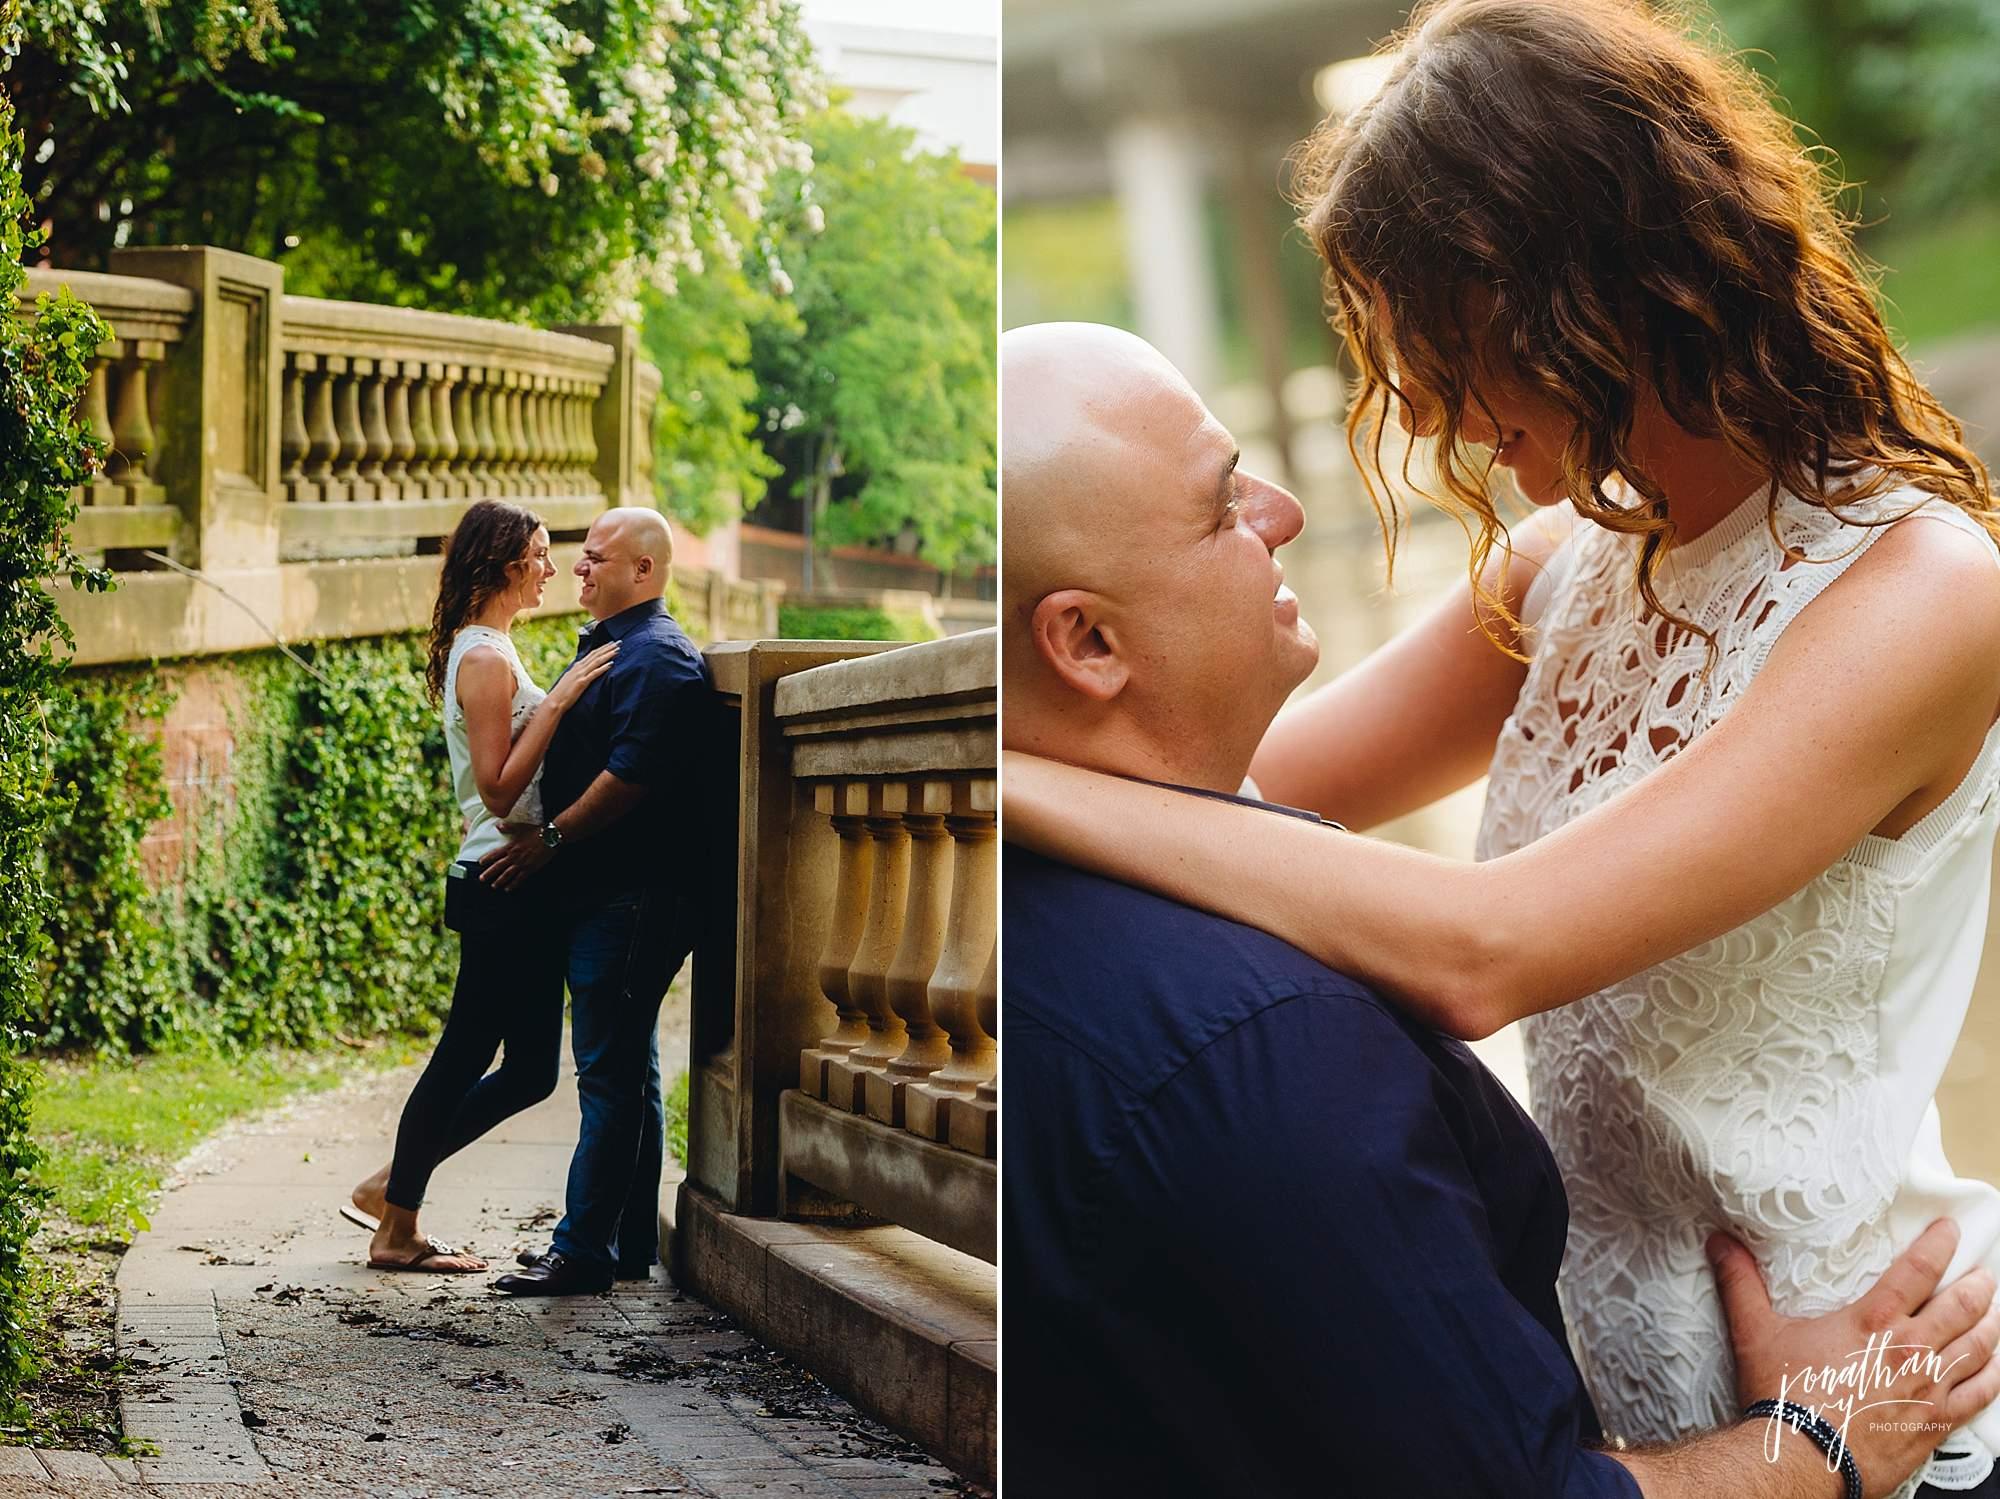 Romantic-Engagement-Photos-Houston_0012.jpg